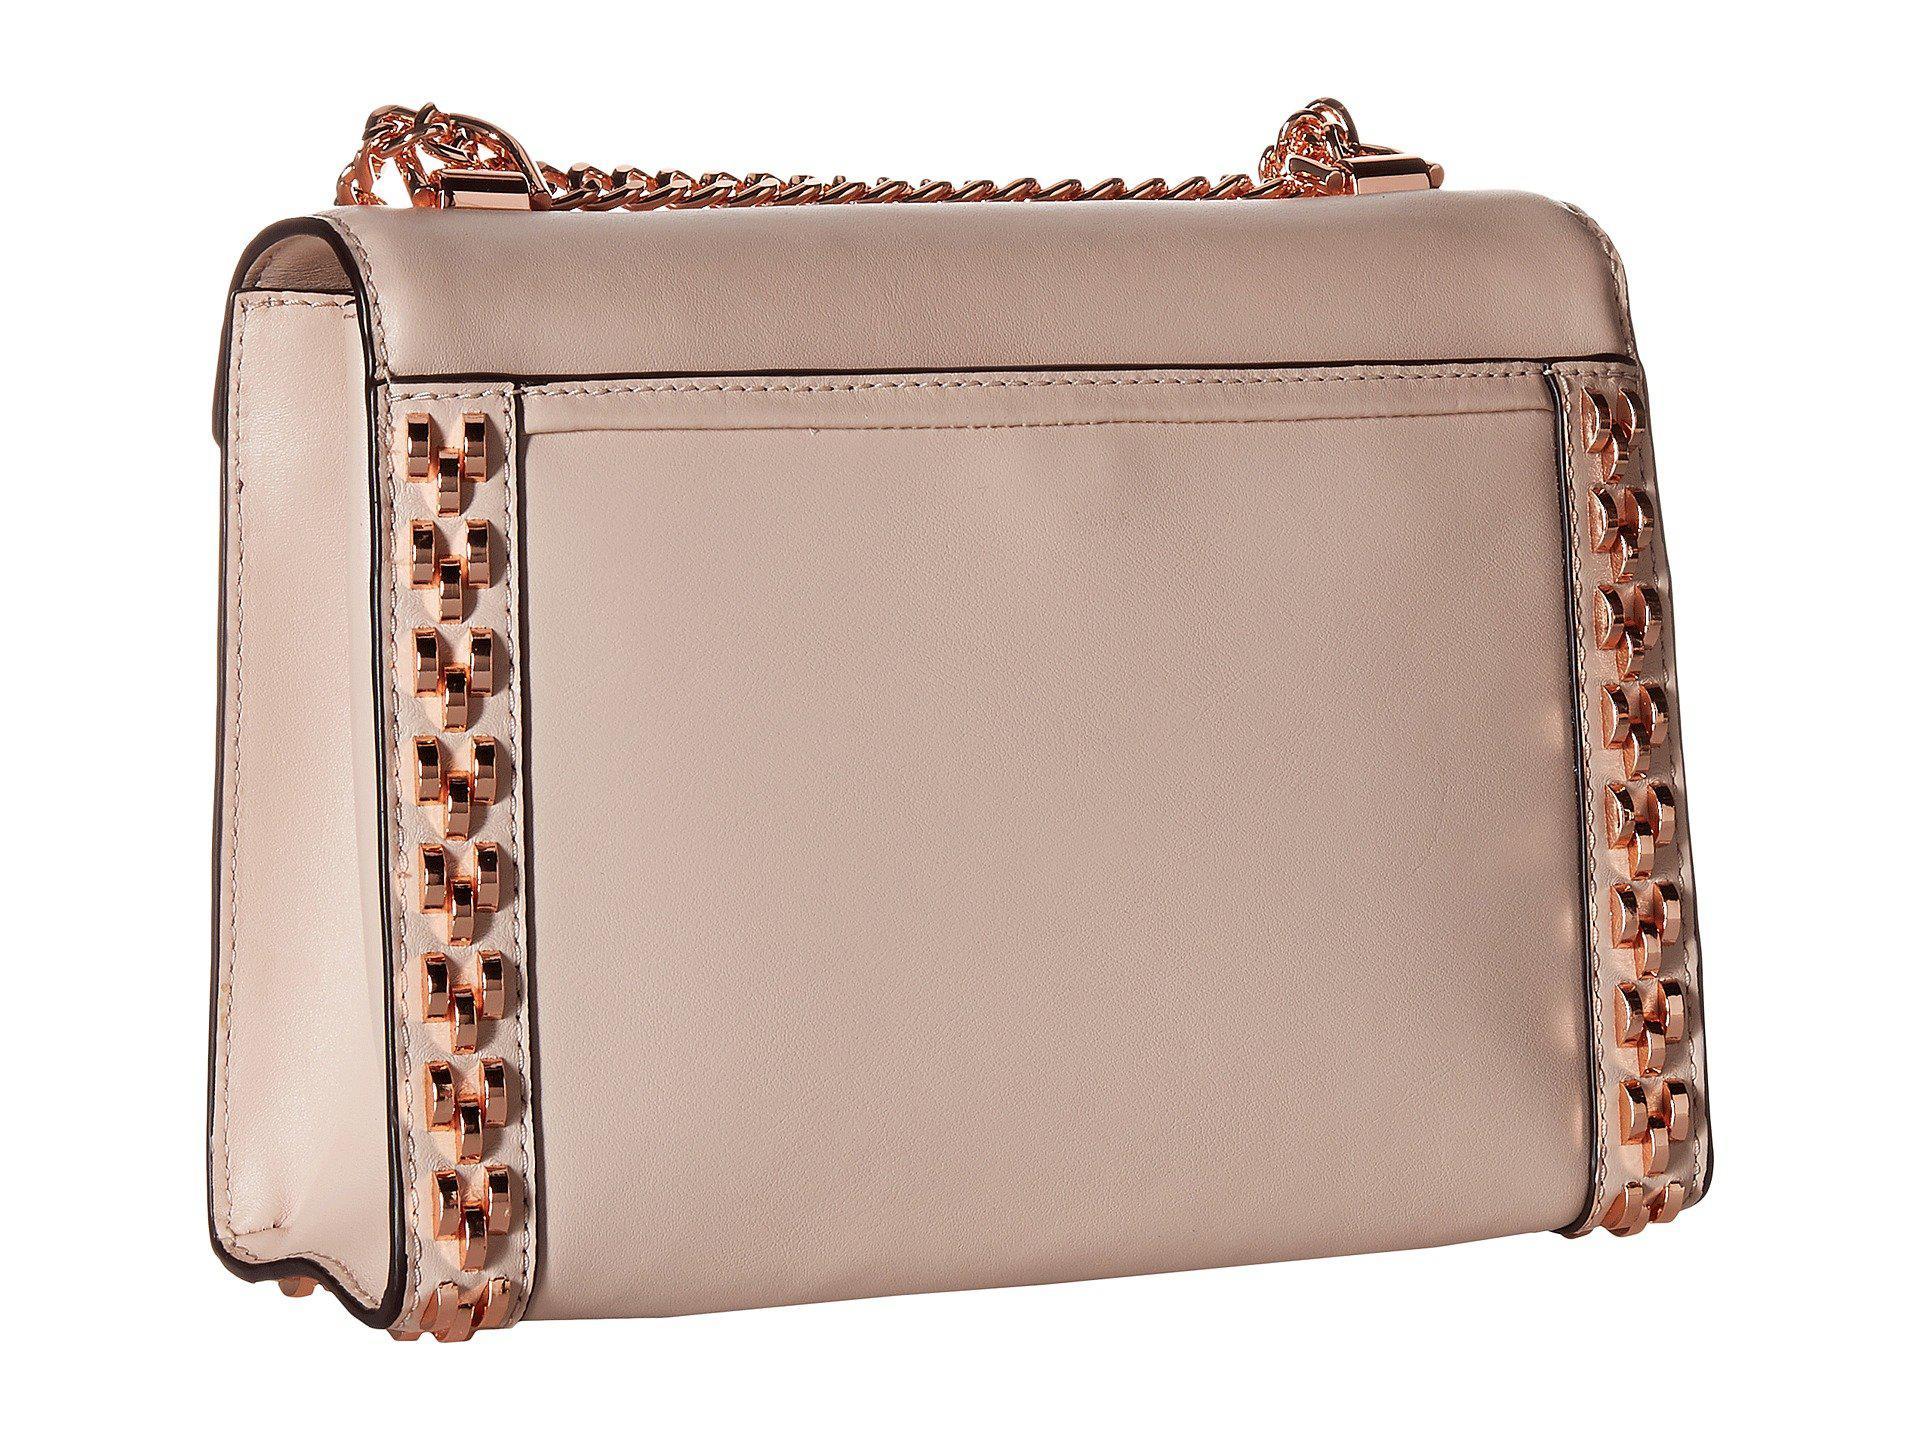 acbf91ecb5a3 ... australia michael michael kors whitney large shoulder soft pink  shoulder handbags lyst. view fullscreen e4395